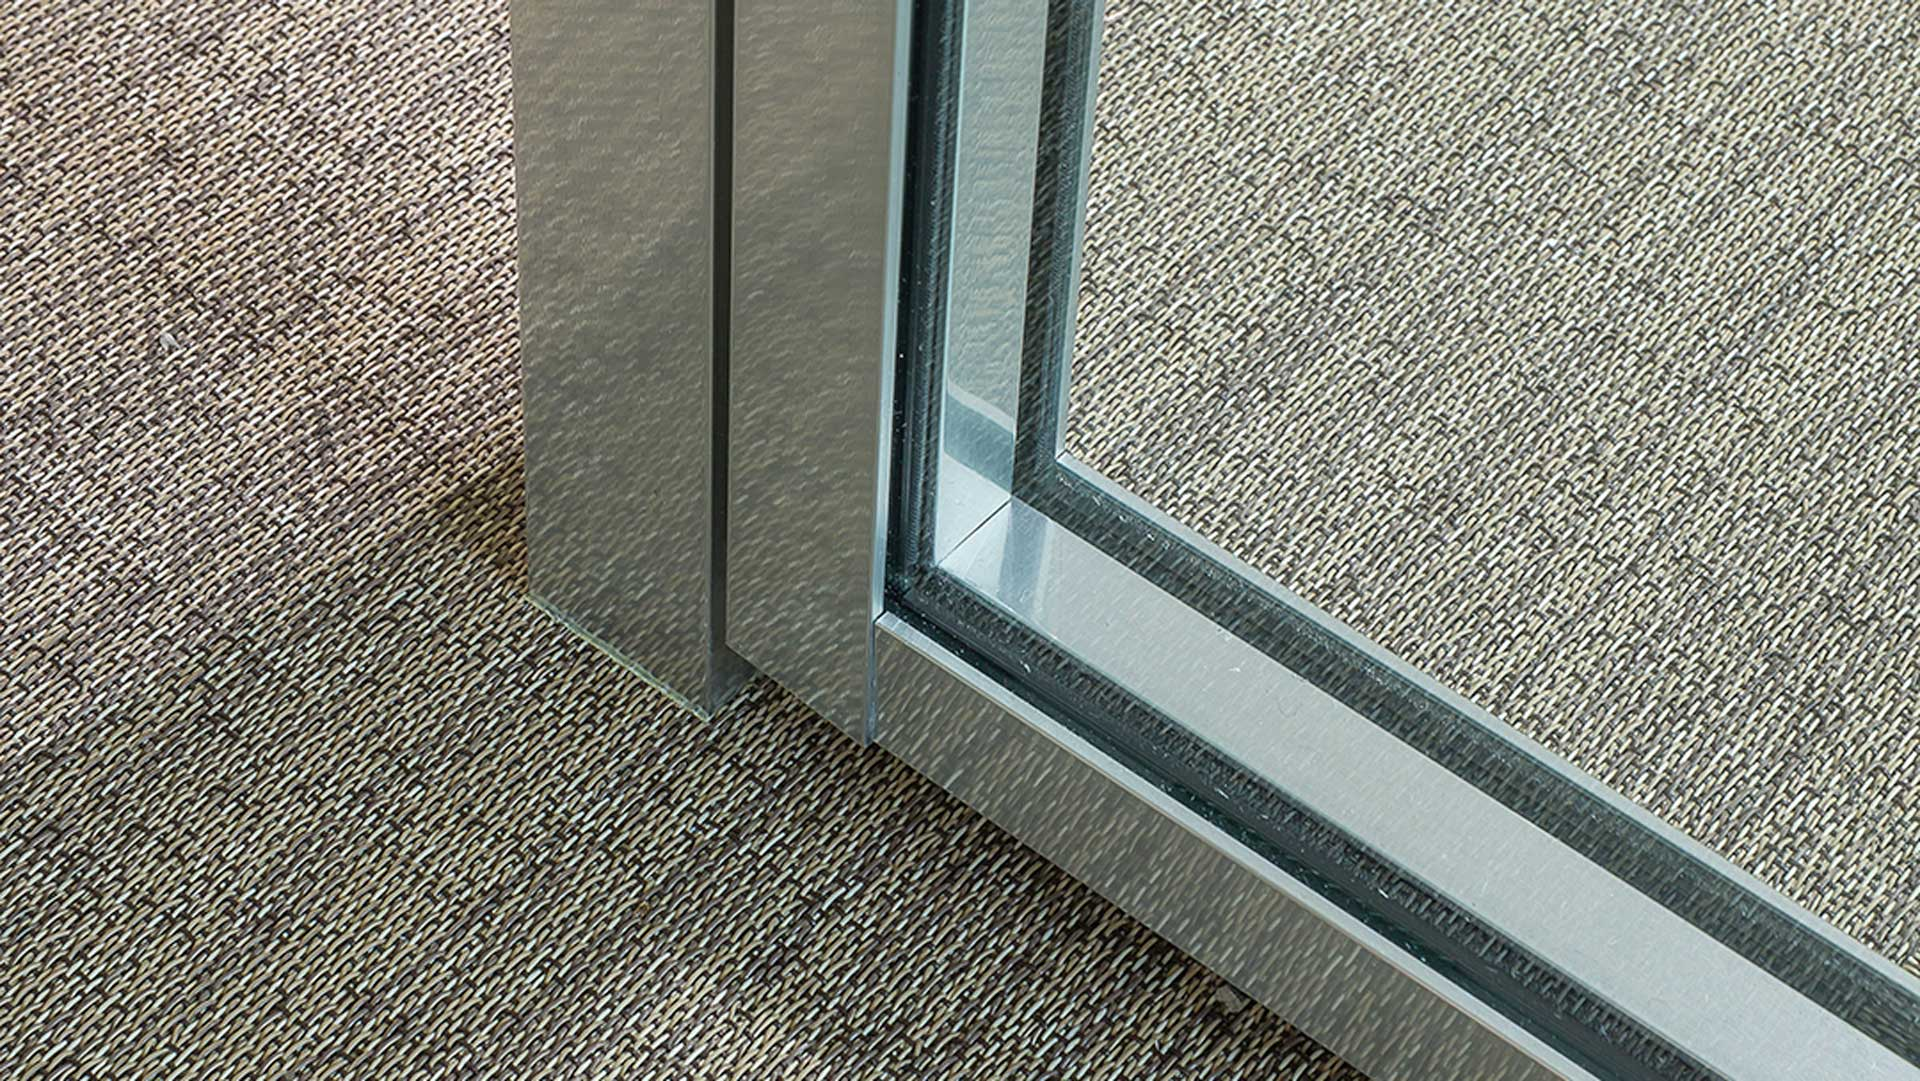 Pareti-divisorie-ufficio-in-vetro-4-Level-Office-Landscape